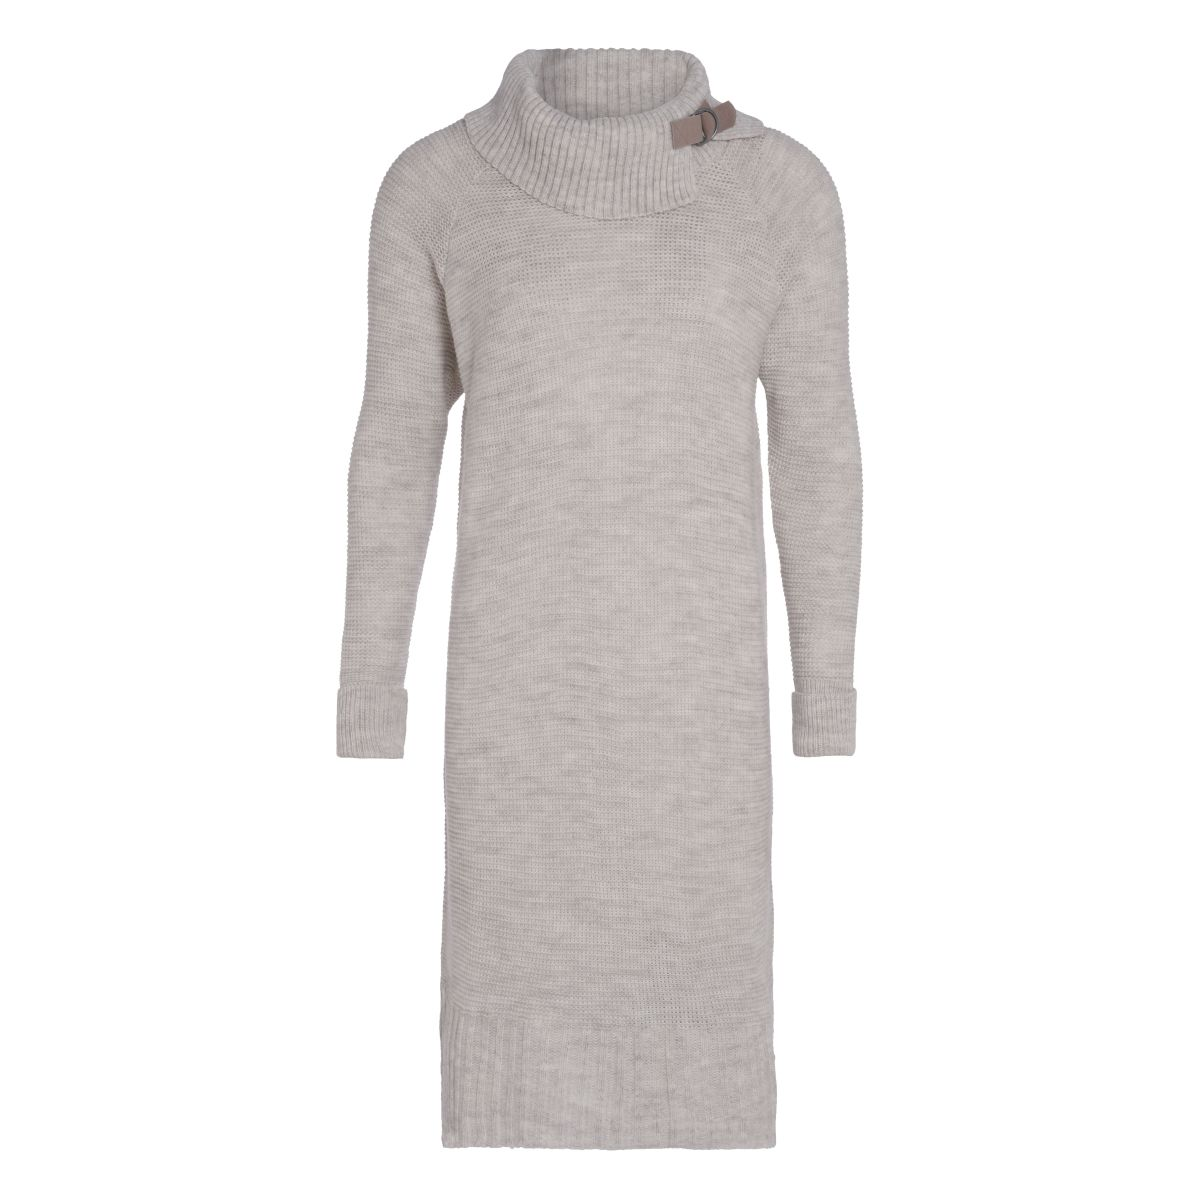 jamie knitted dress beige 4042